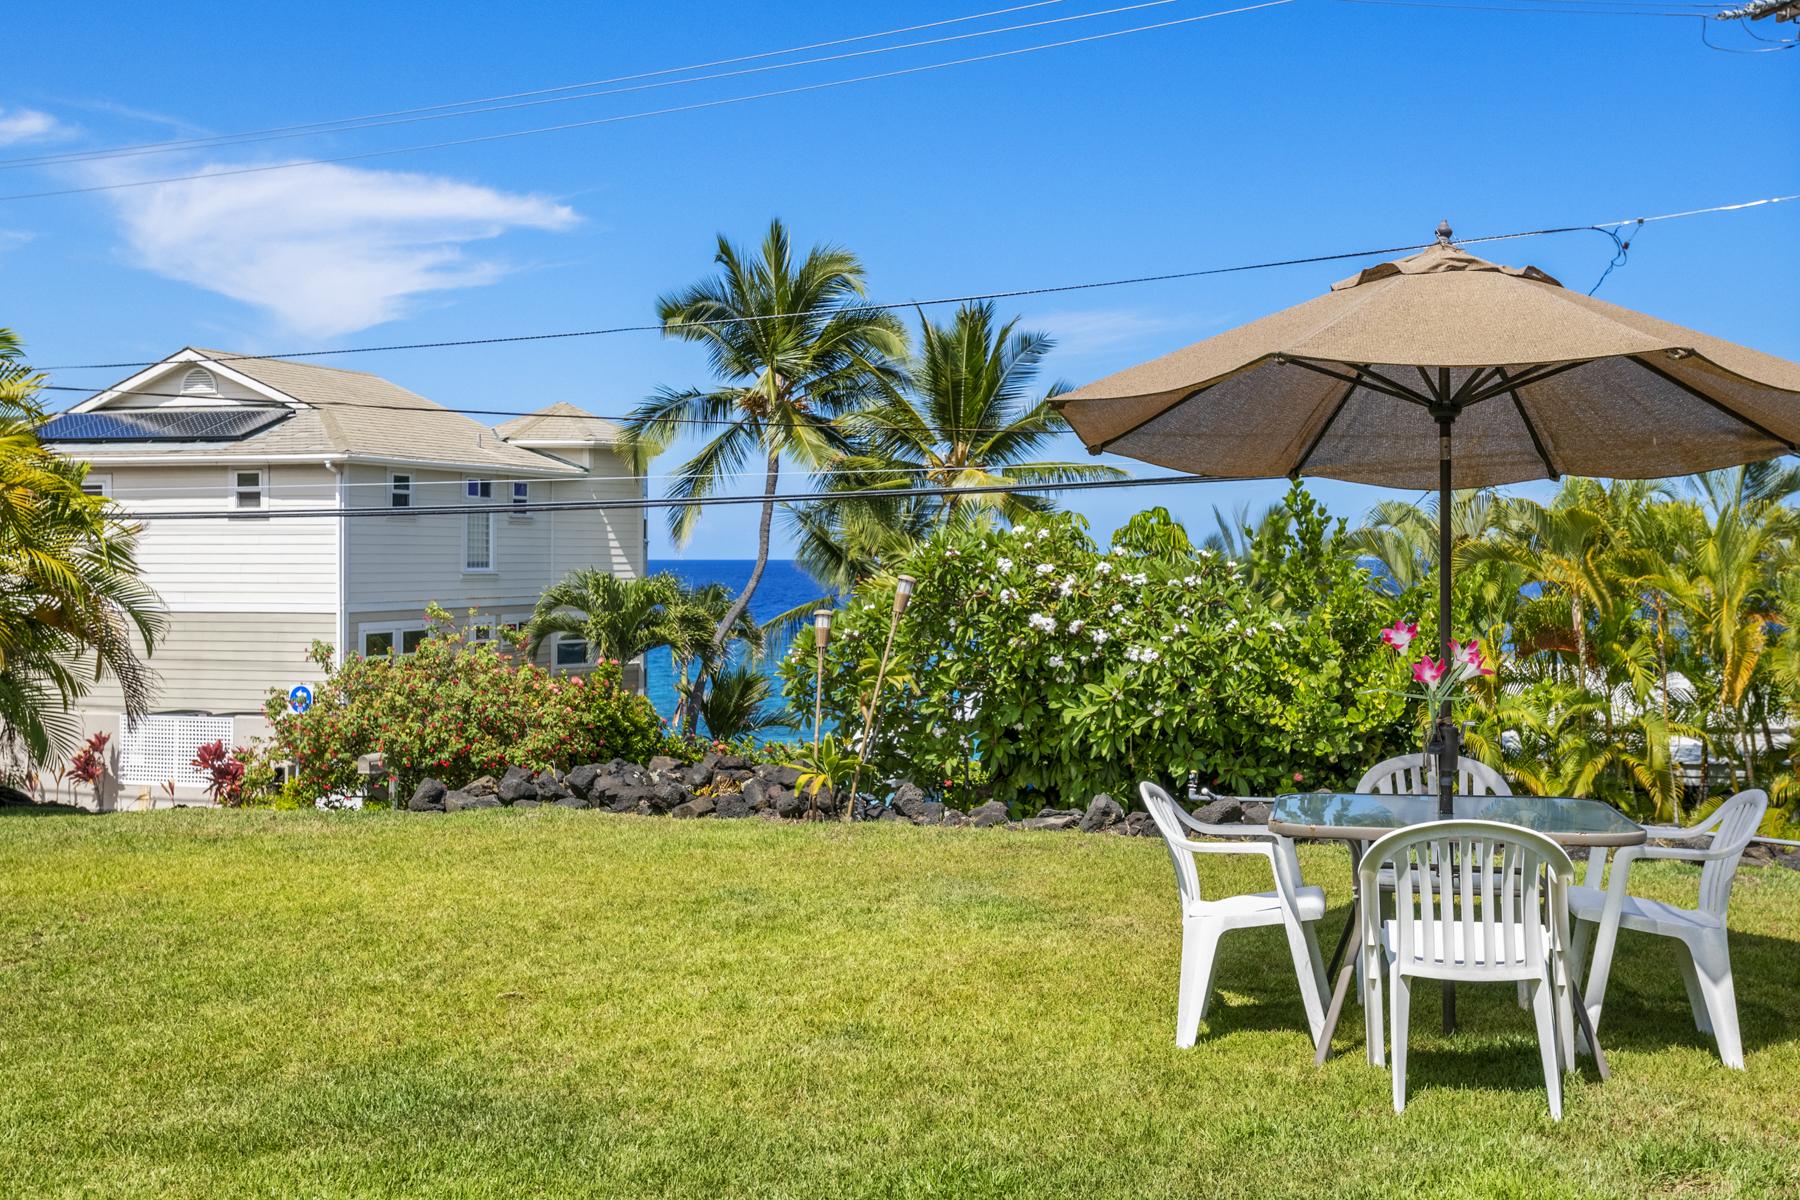 Additional photo for property listing at Fabulous Alii Drive 77-103 Queen Kalama Ave, Kailua-Kona, 夏威夷 96740 美國